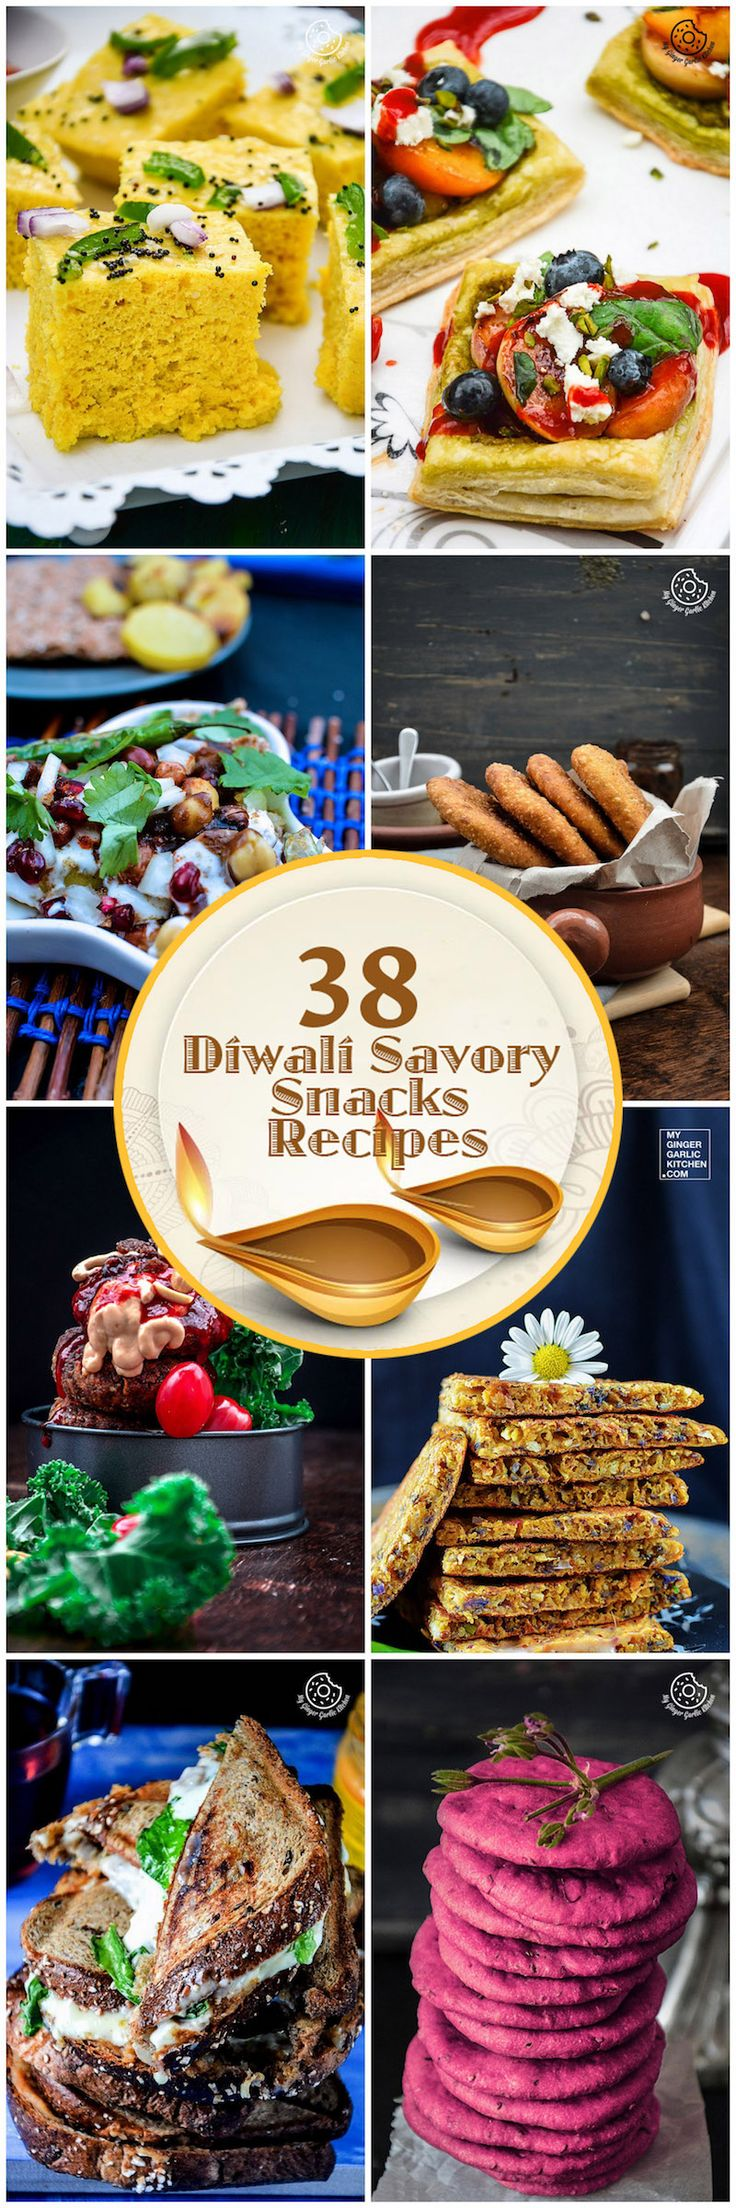 38 Diwali Savory Snacks Recipes You Would Love To Try! #diwali #snacks #vegetarian